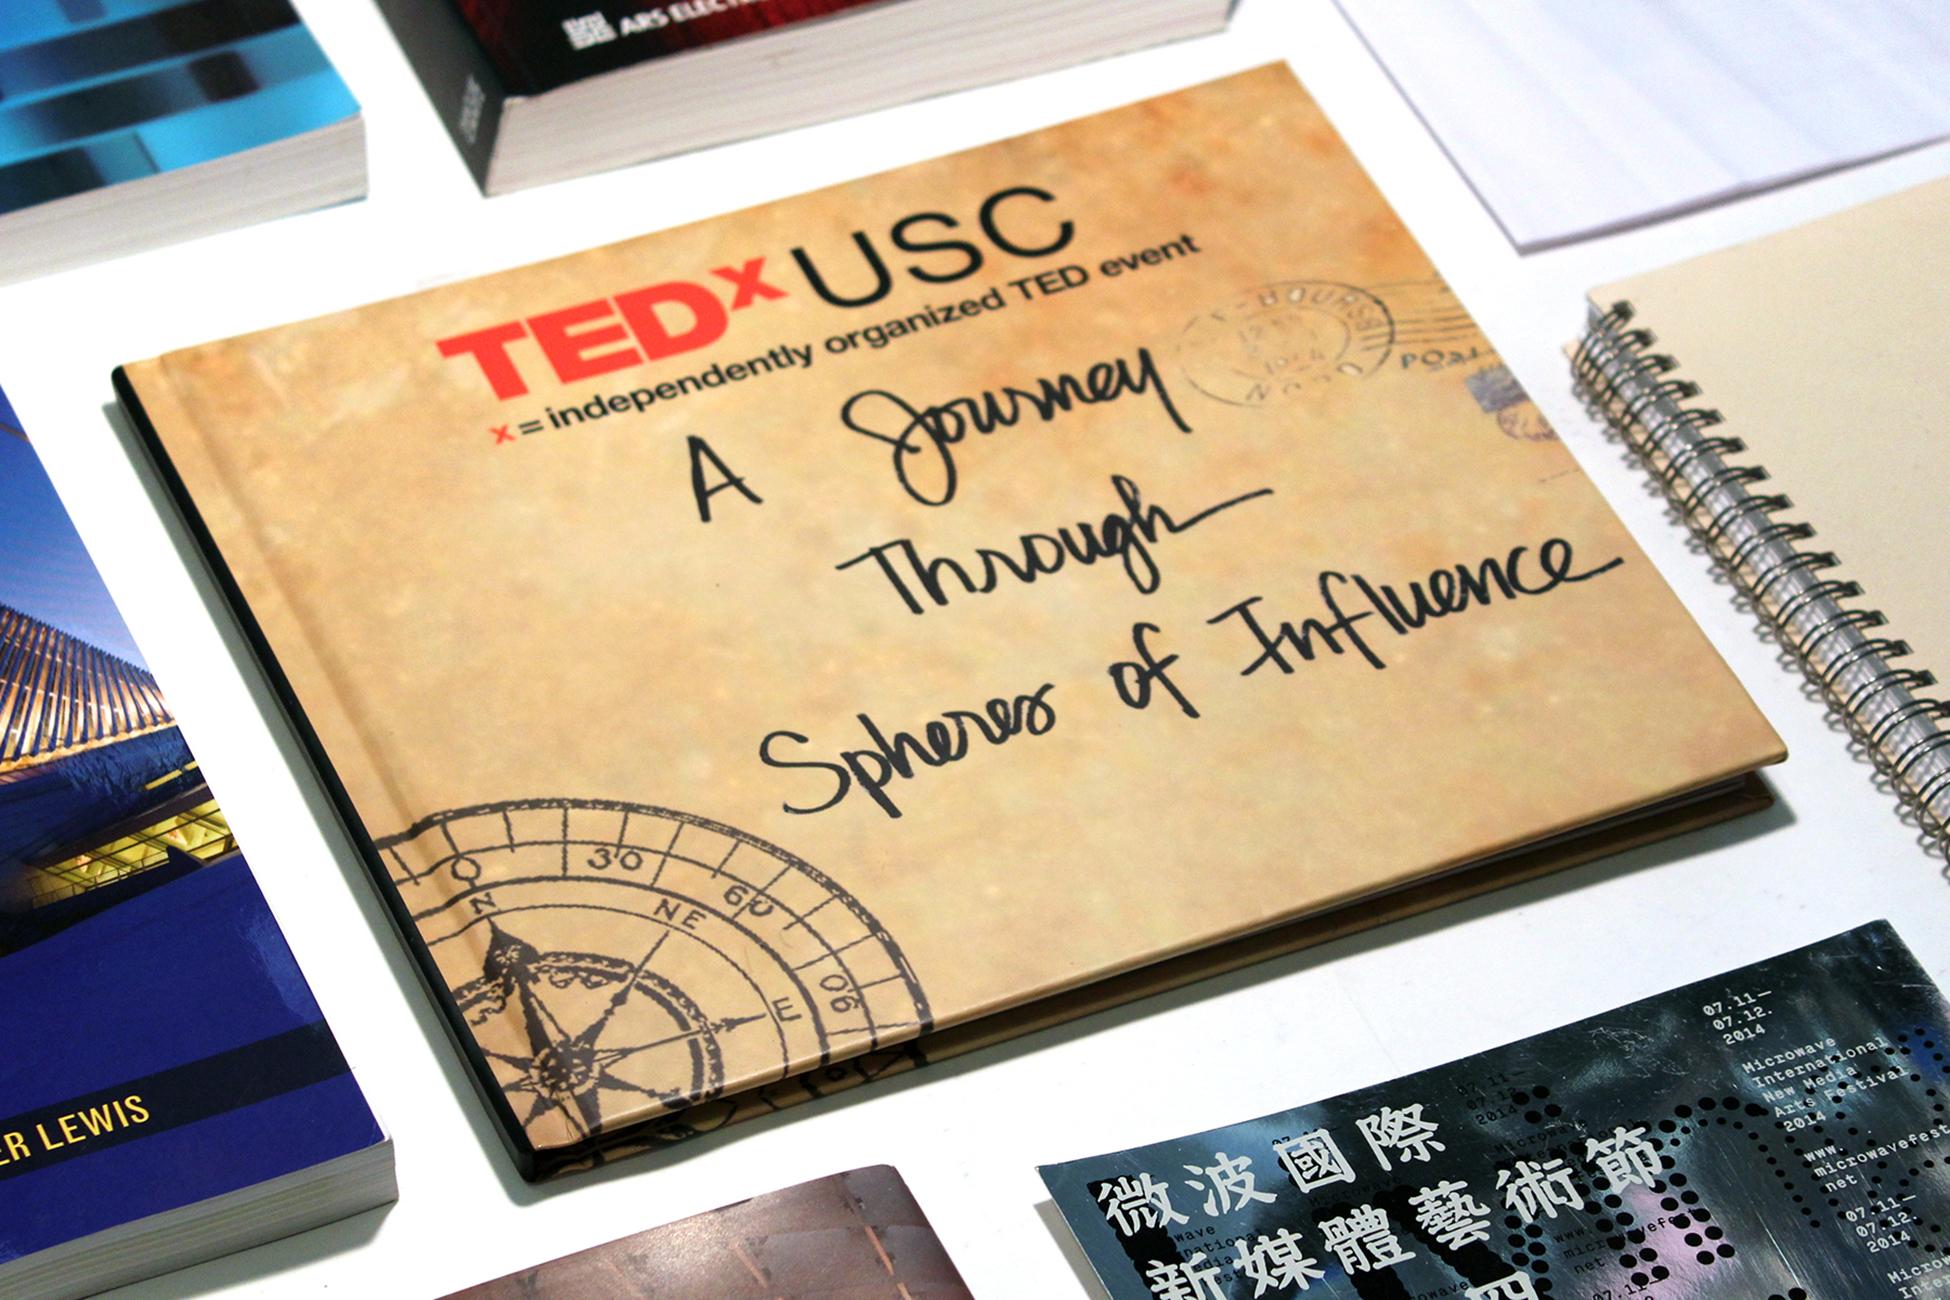 2012-05 TEDxUSC